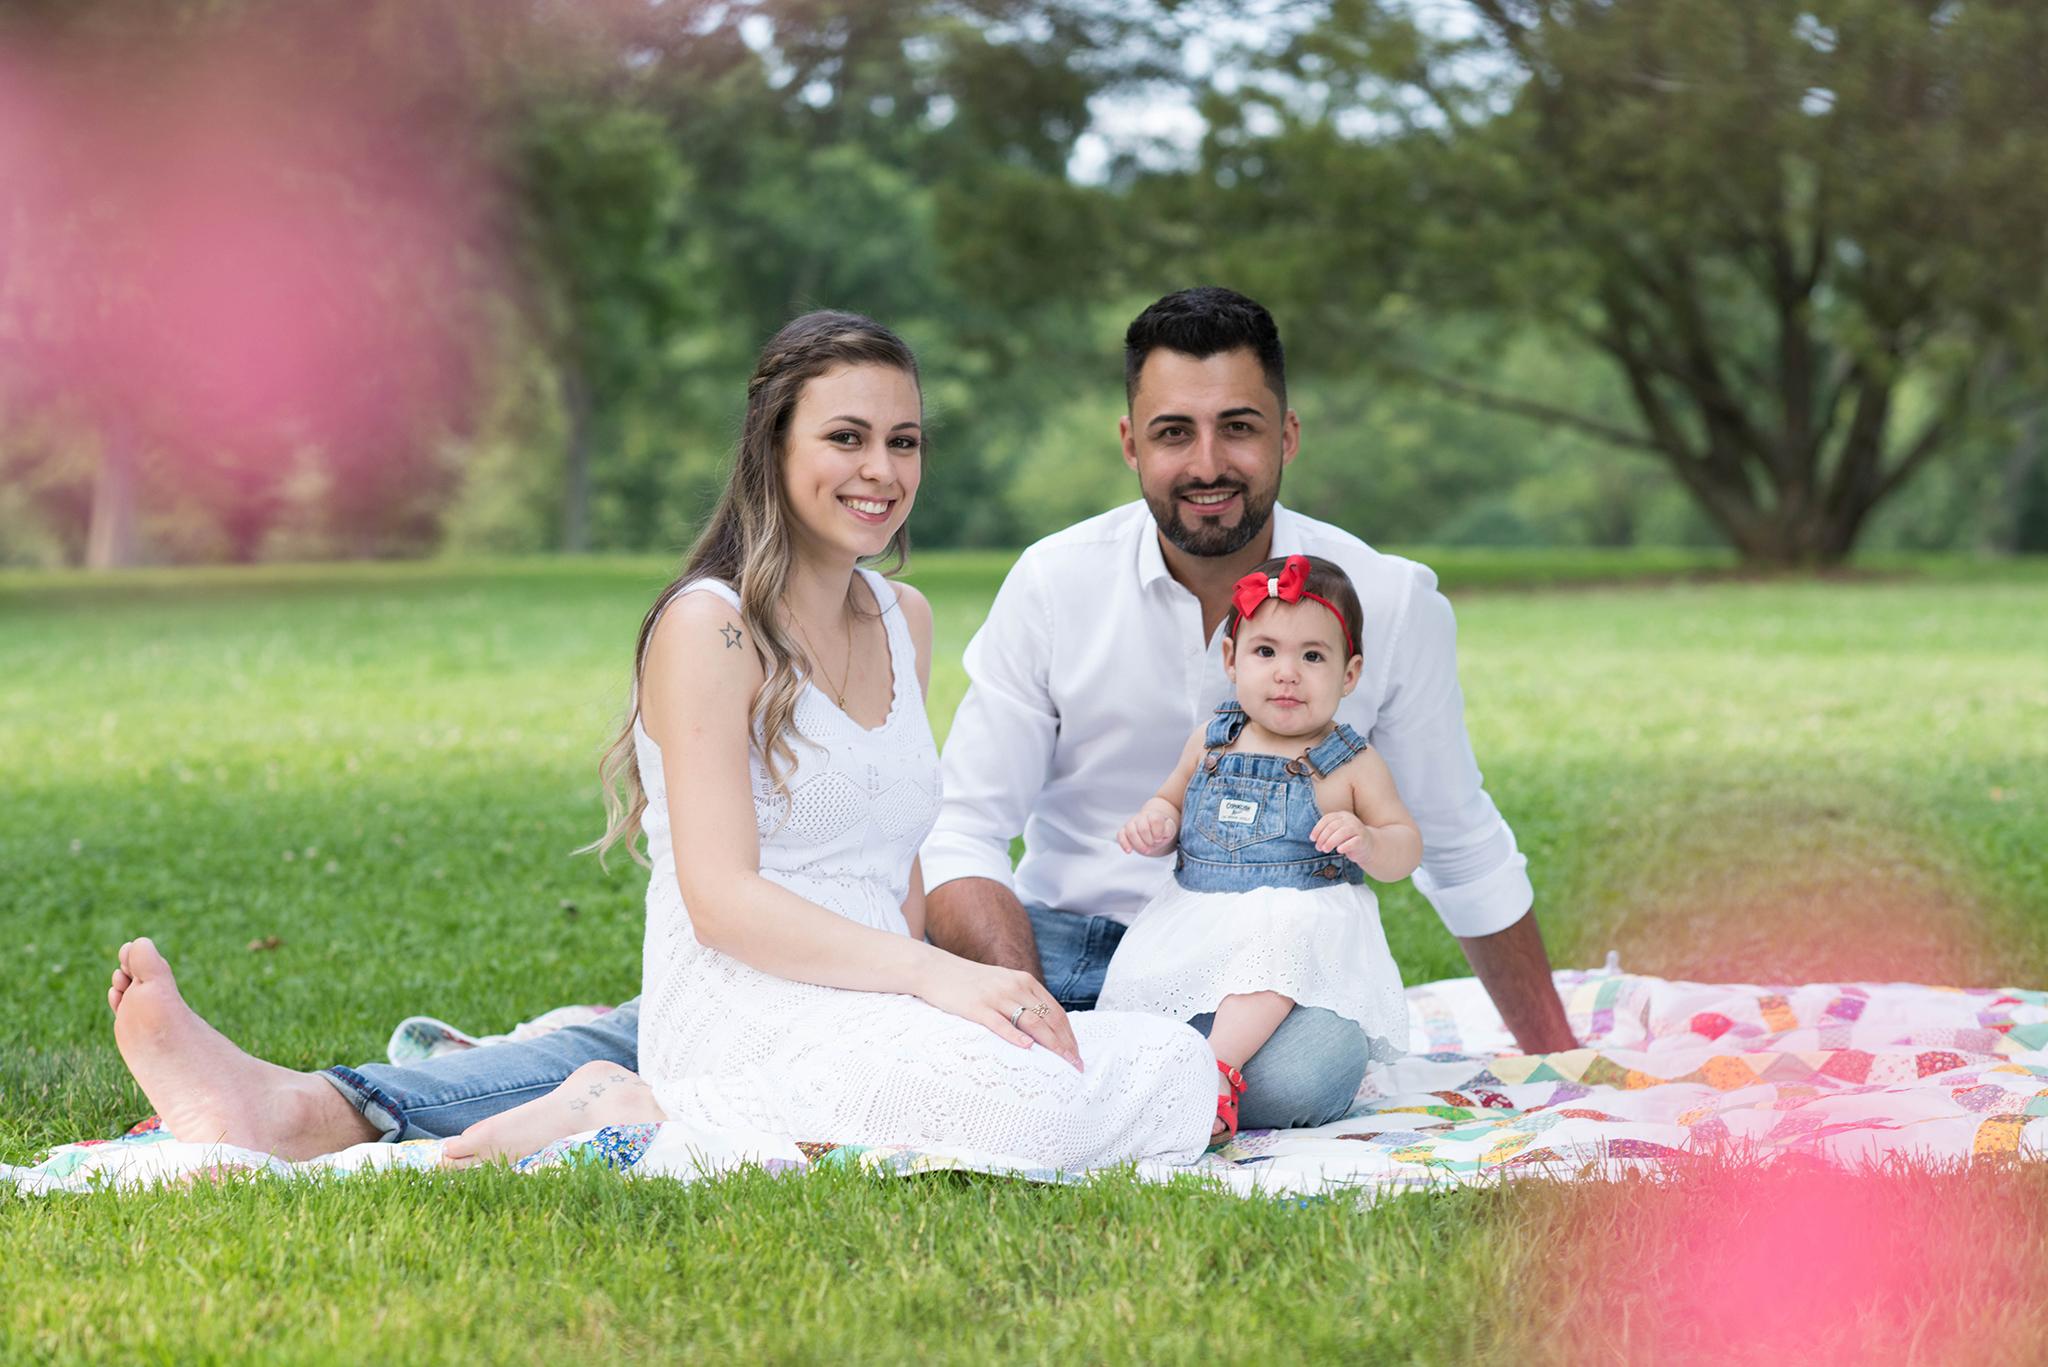 NJ-Newborn-family-Photographer-10.JPG